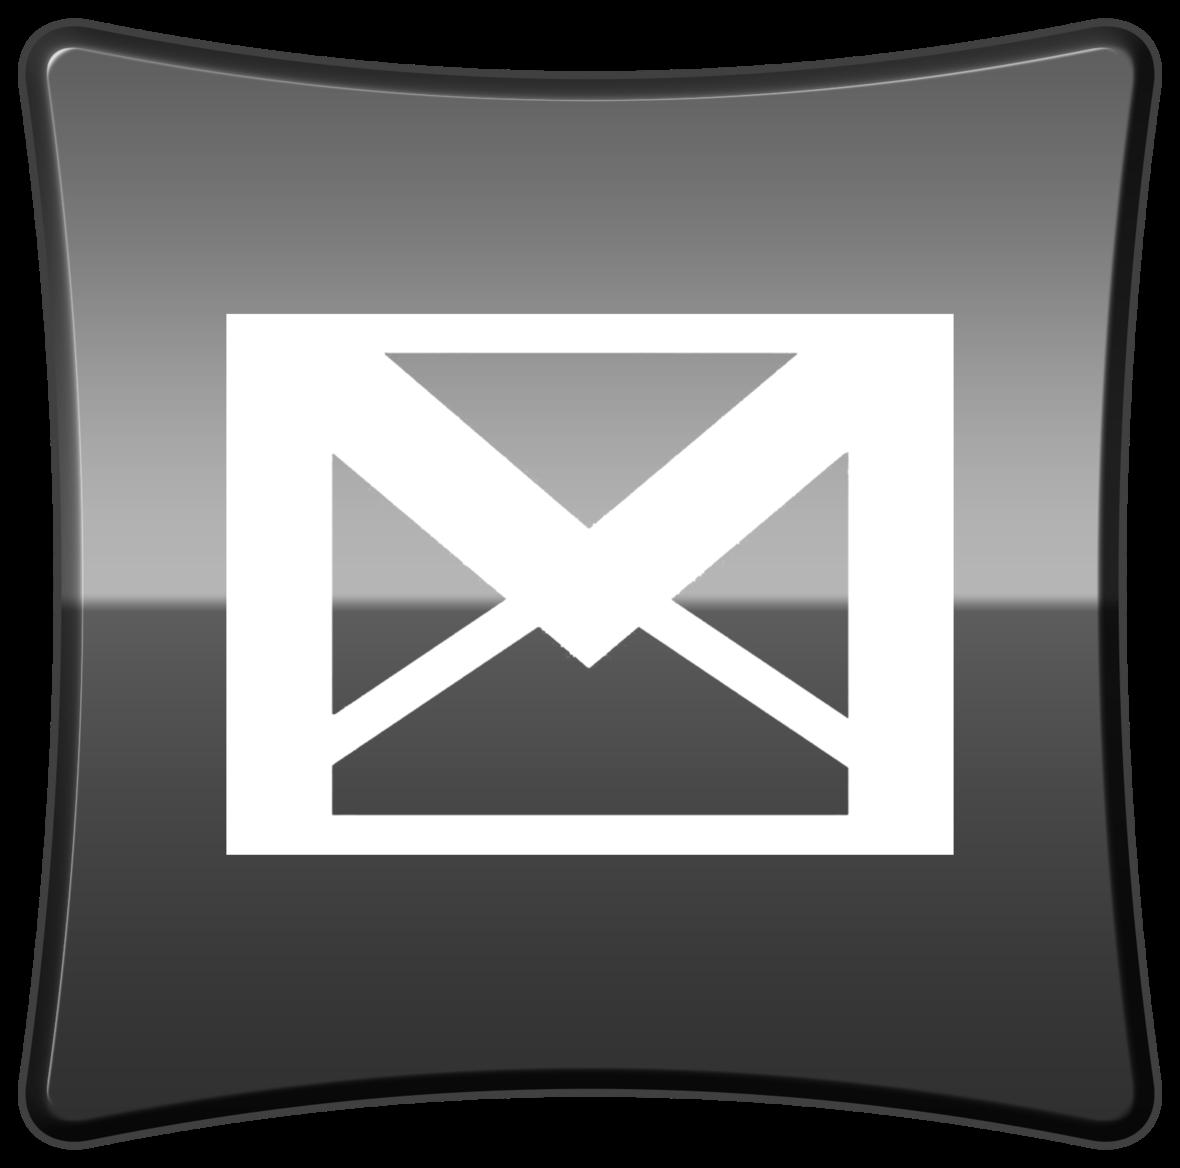 GreyGmailButton